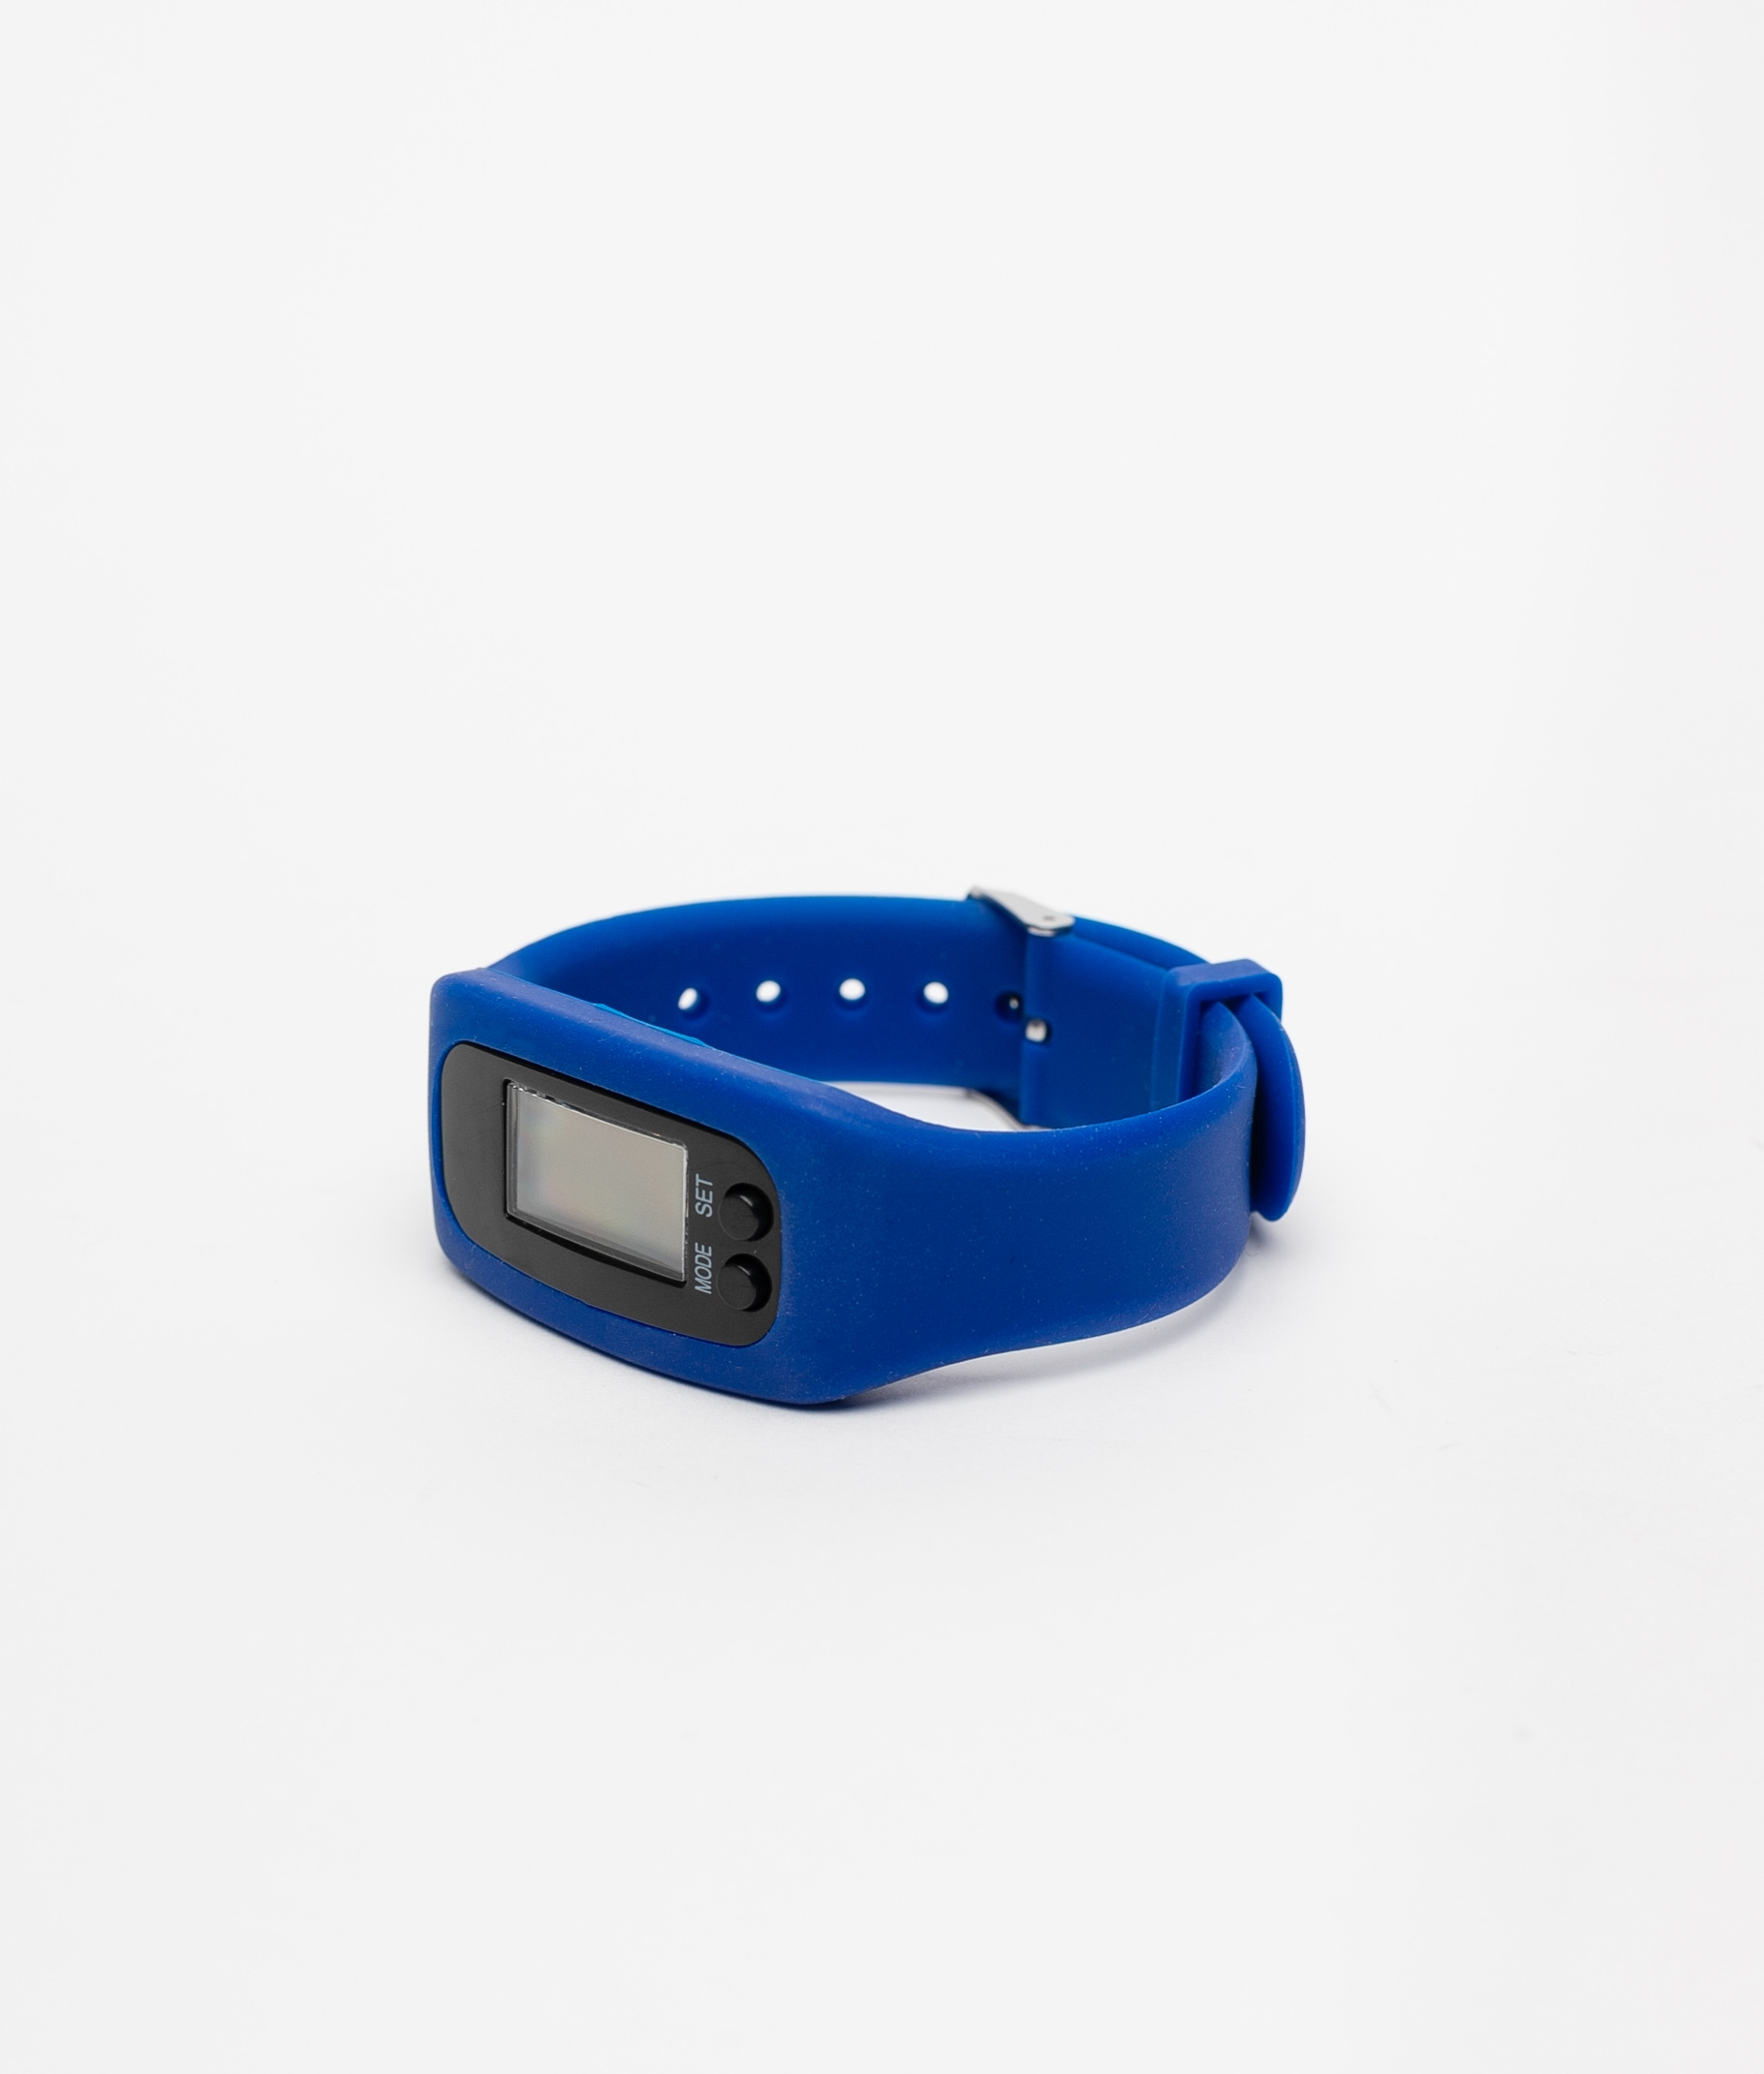 Reloj Fornax - Blue